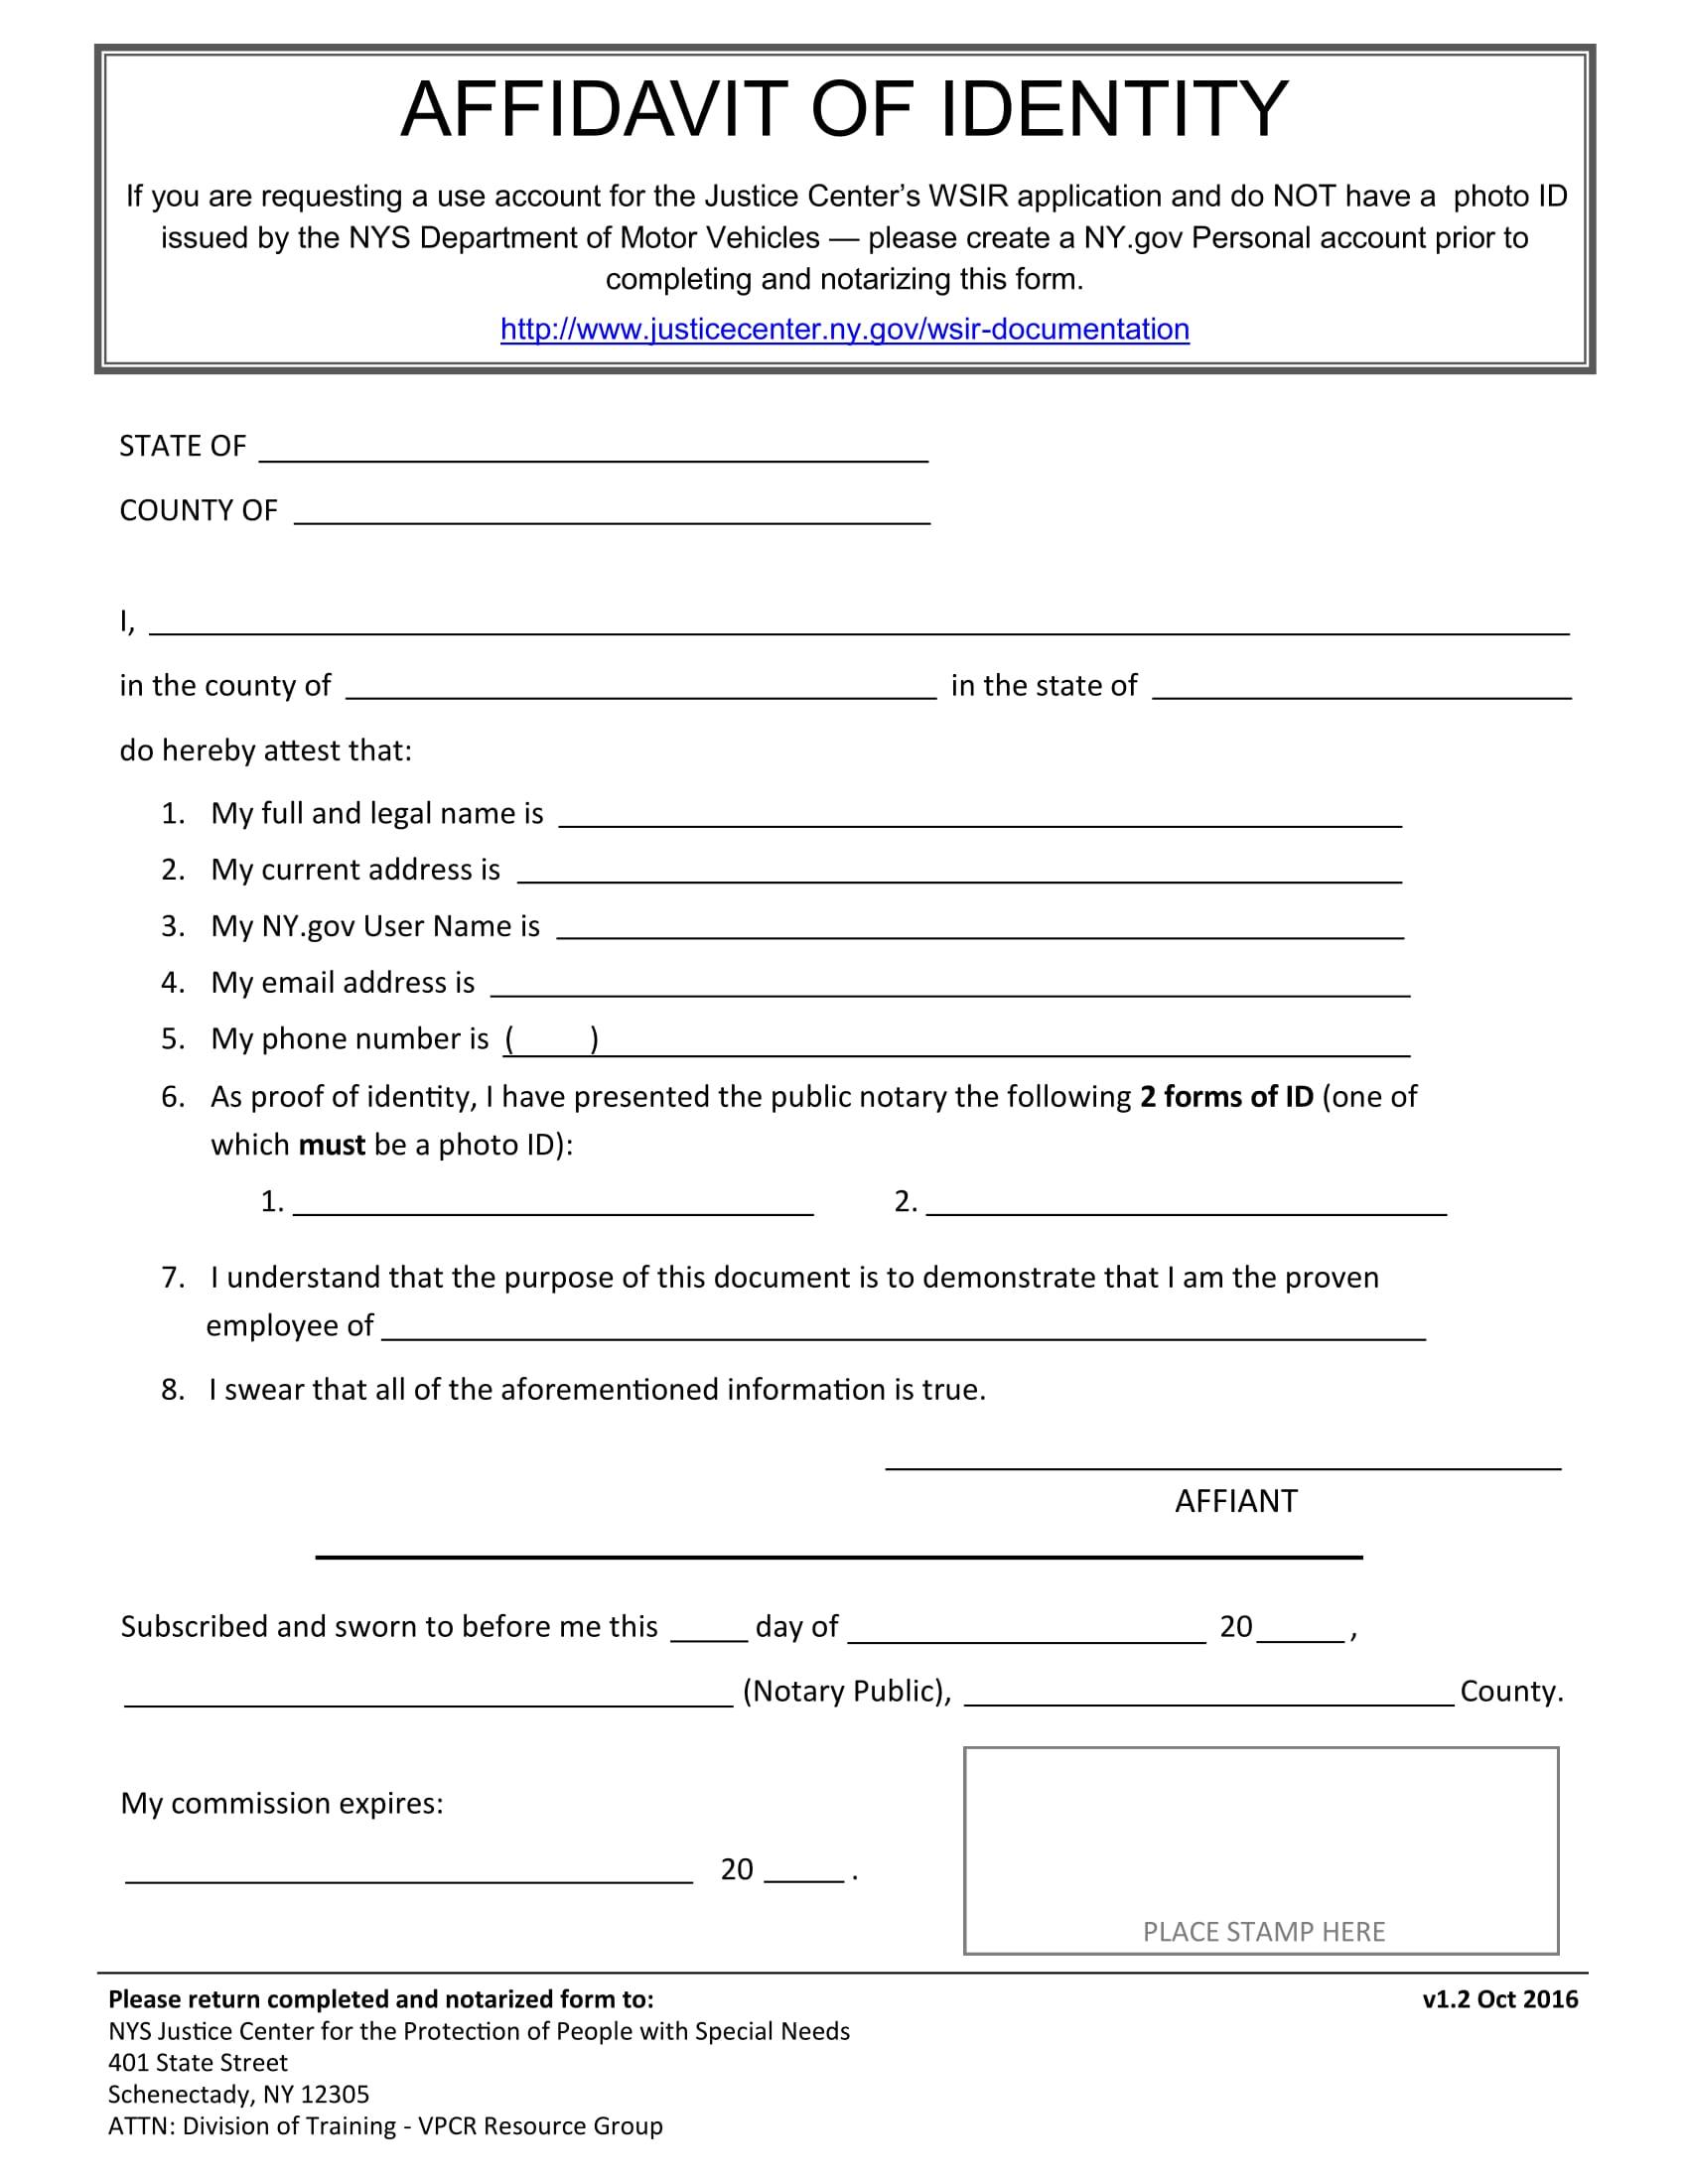 employee affidavit of identity 1